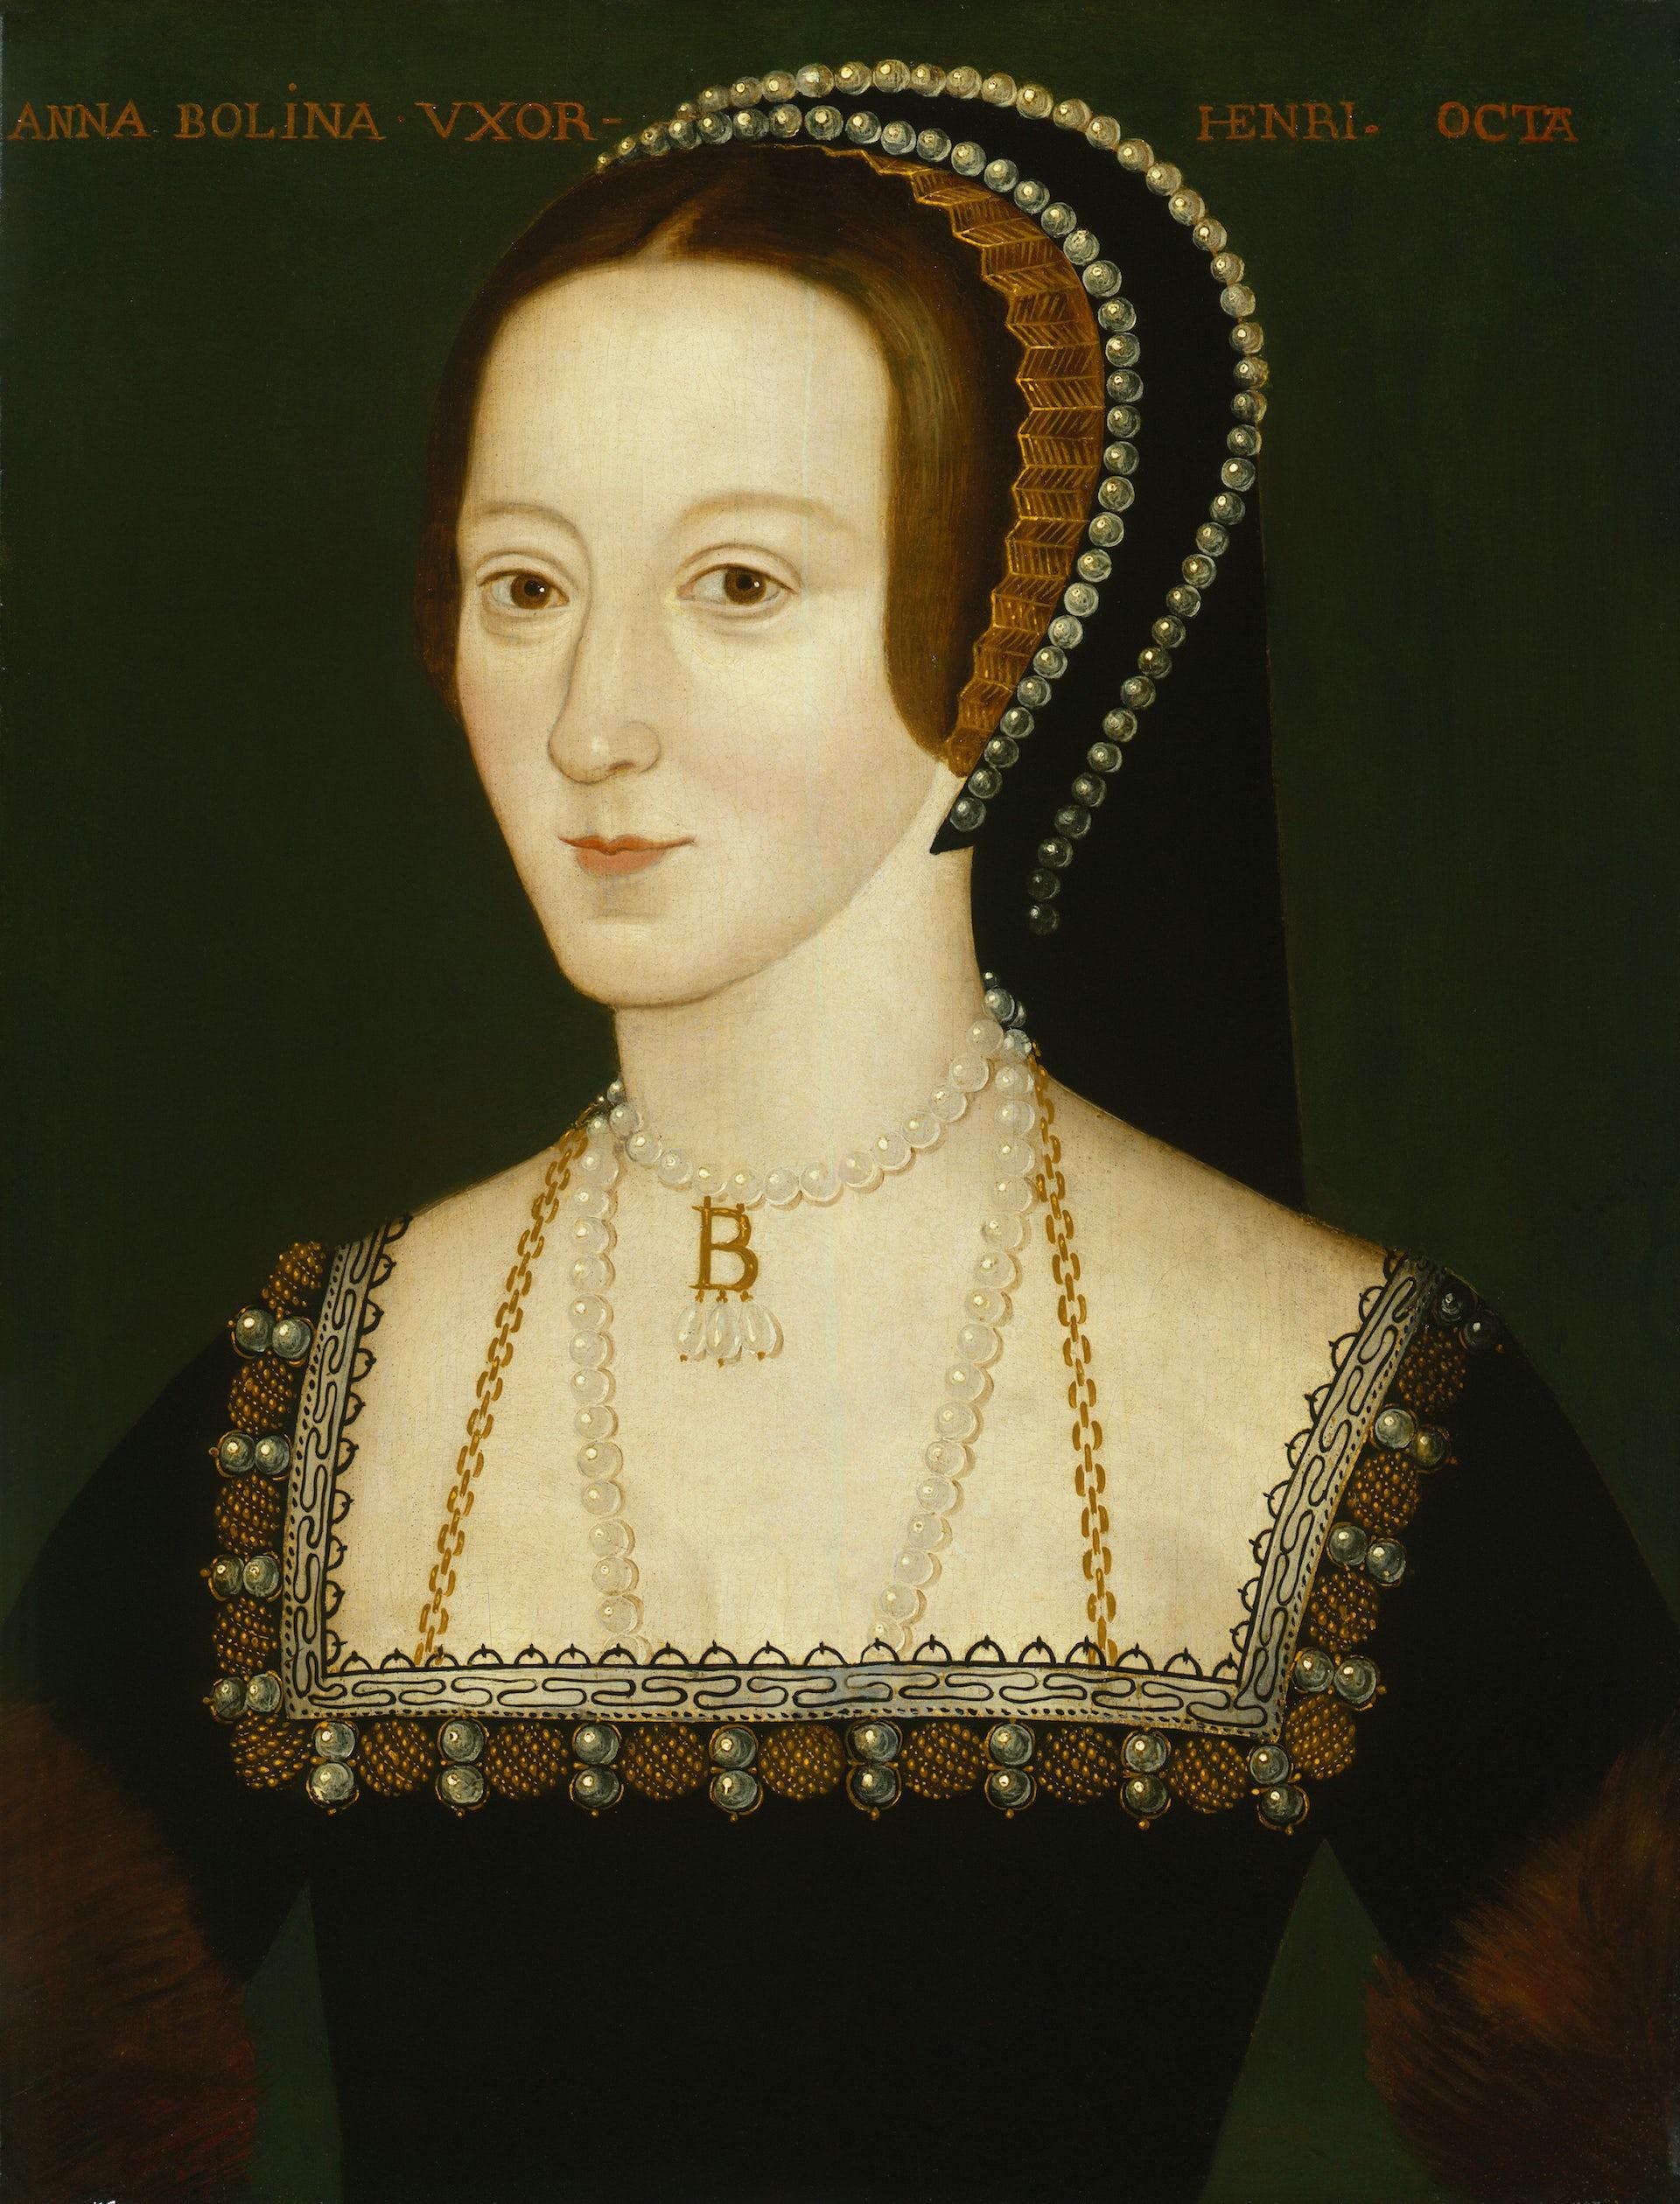 Did Anne Boleyn really try to speak after being beheaded?